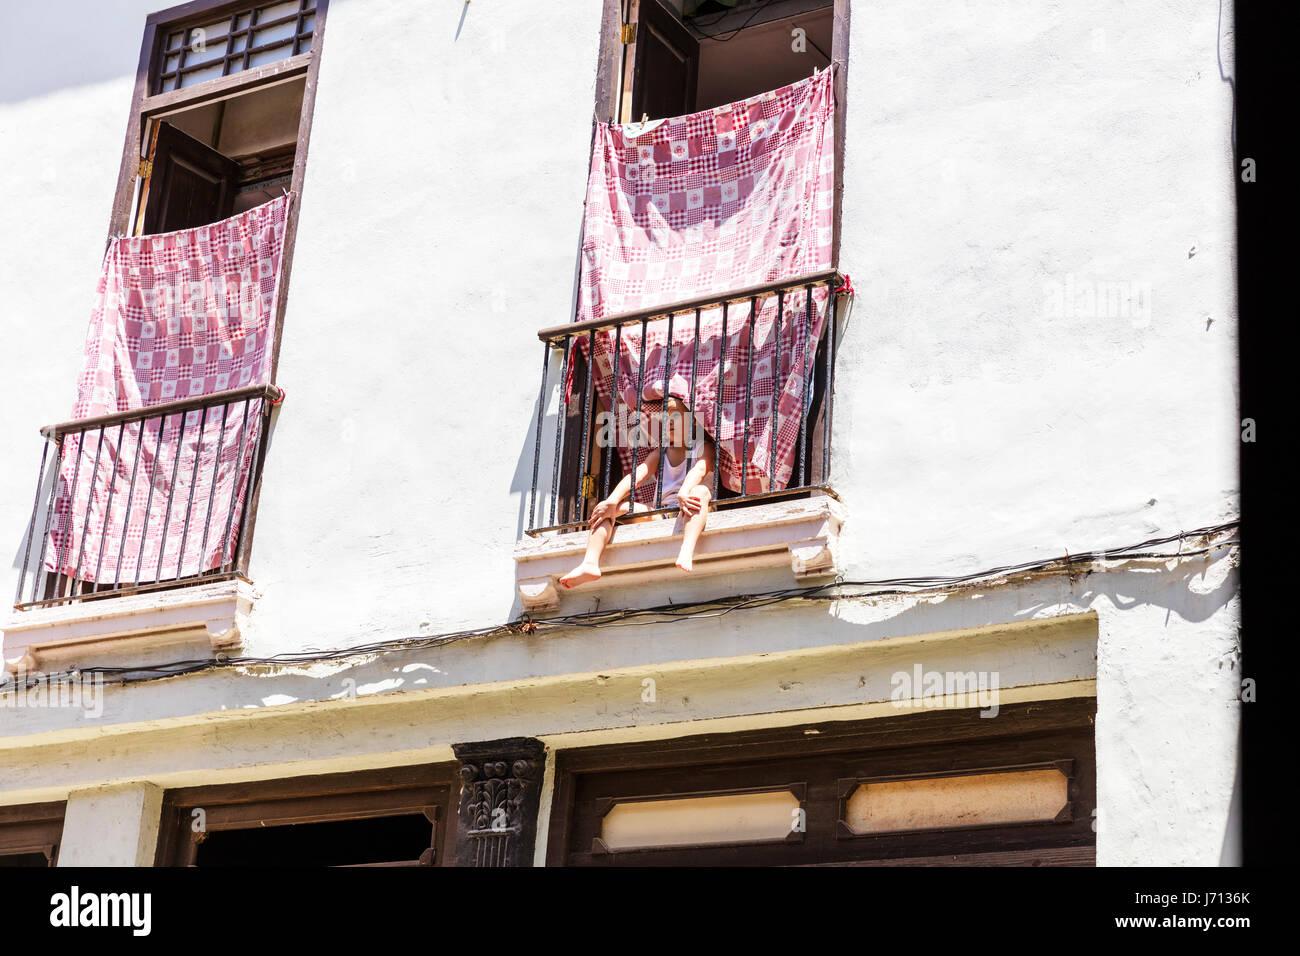 Young boy on hotel balcony alone, young boy looking through railing on hotel balcony, child on balcony, Havana Cuba - Stock Image